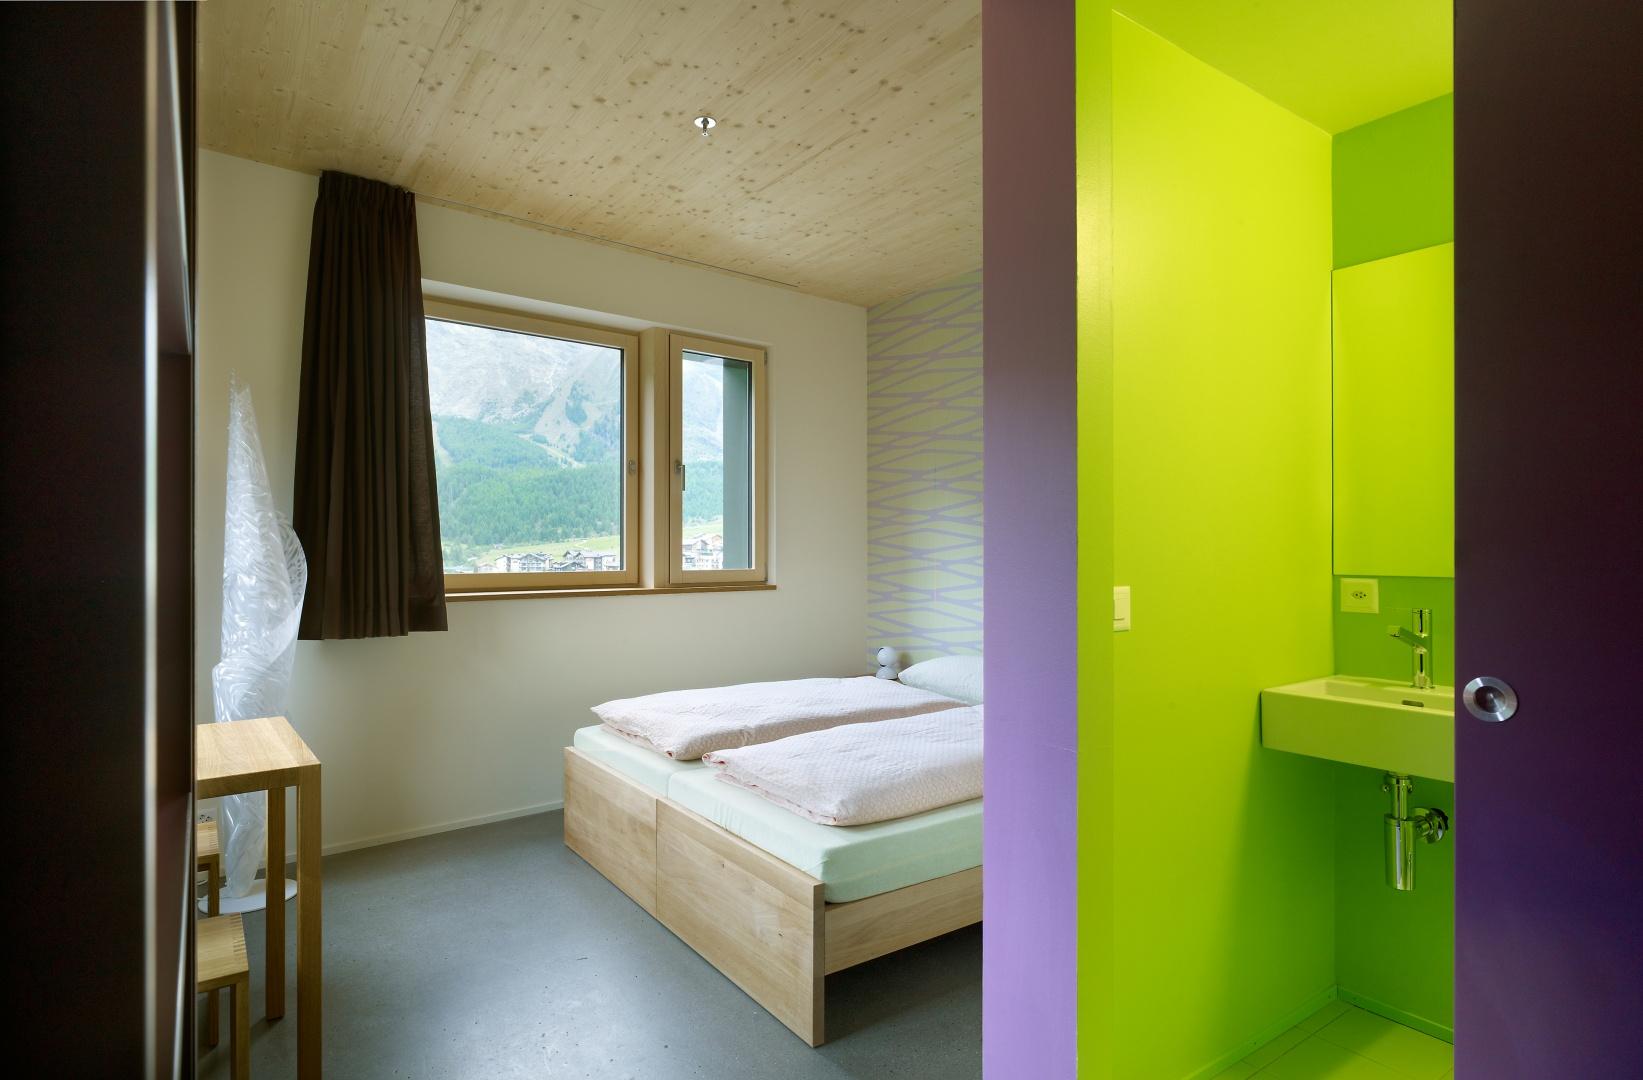 Doppelzimmer © Ruedi Walti, Basel